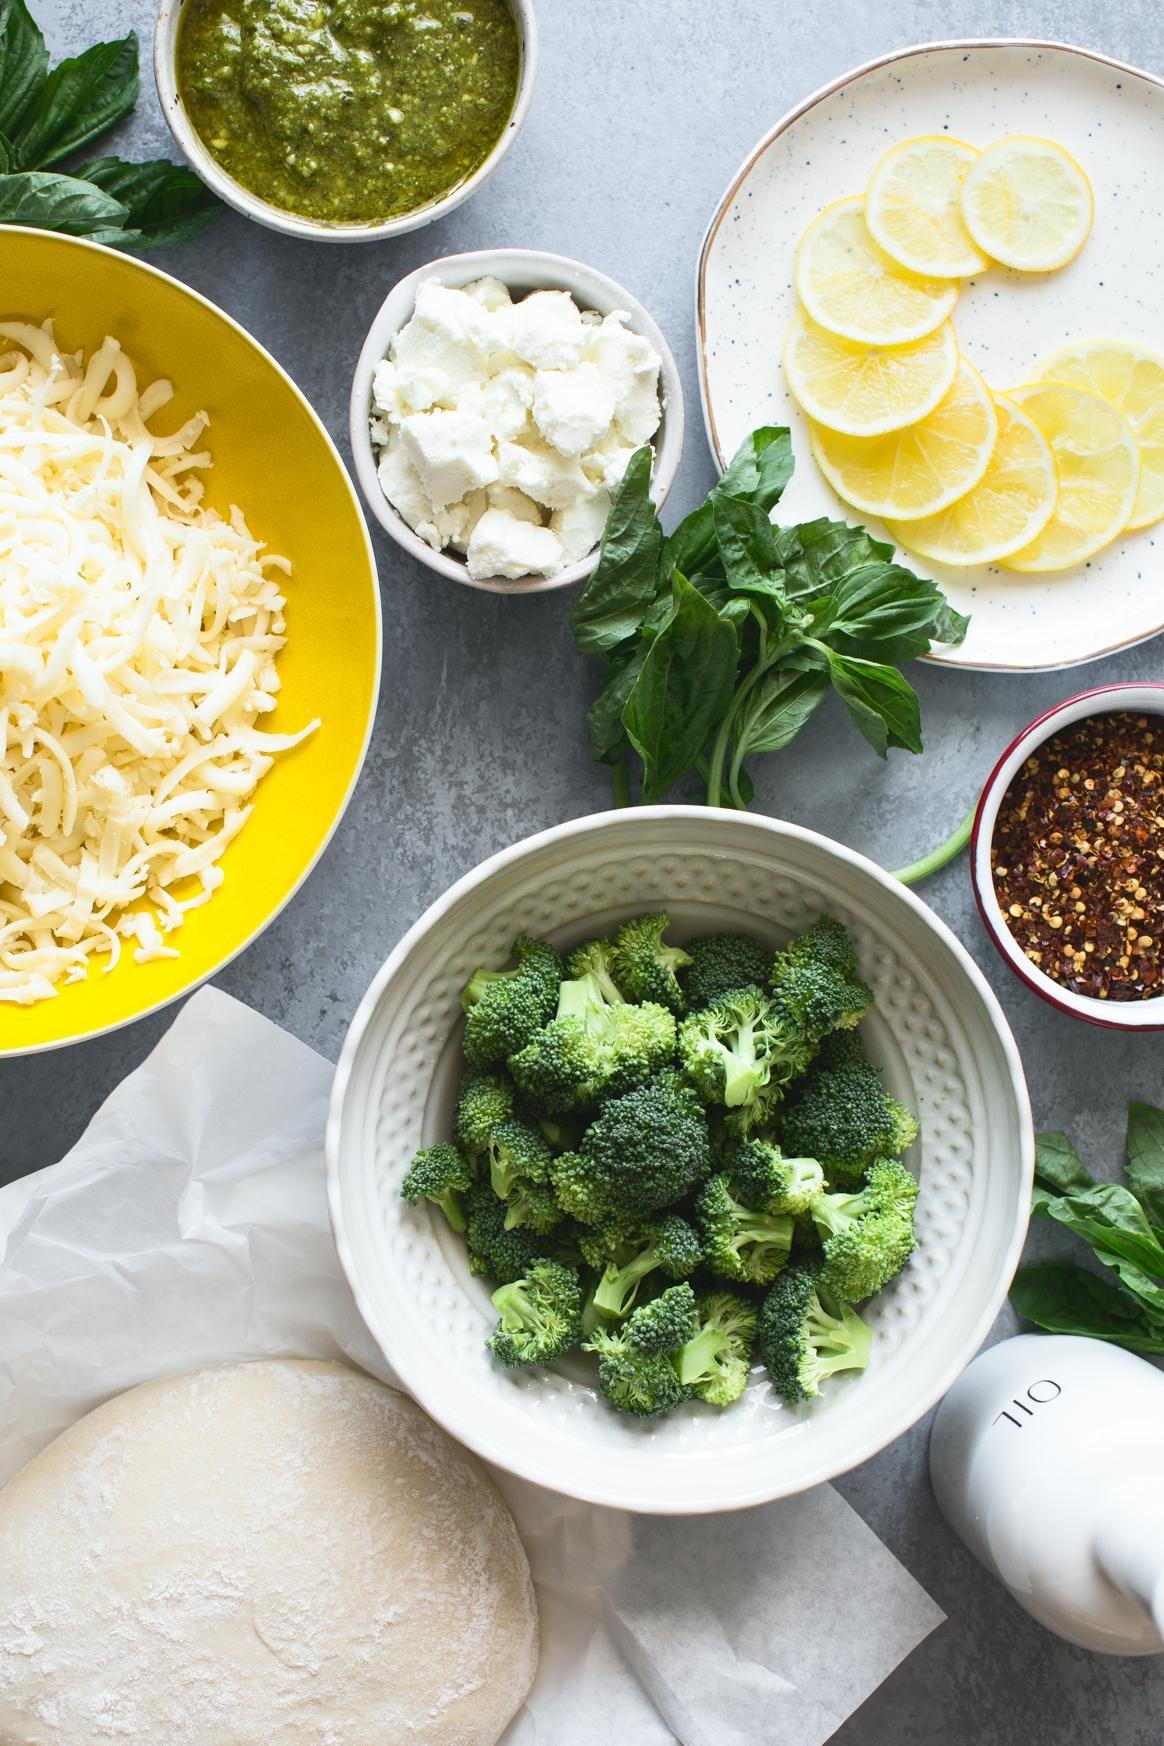 Lemon Roasted Broccoli Pizza Ingredients